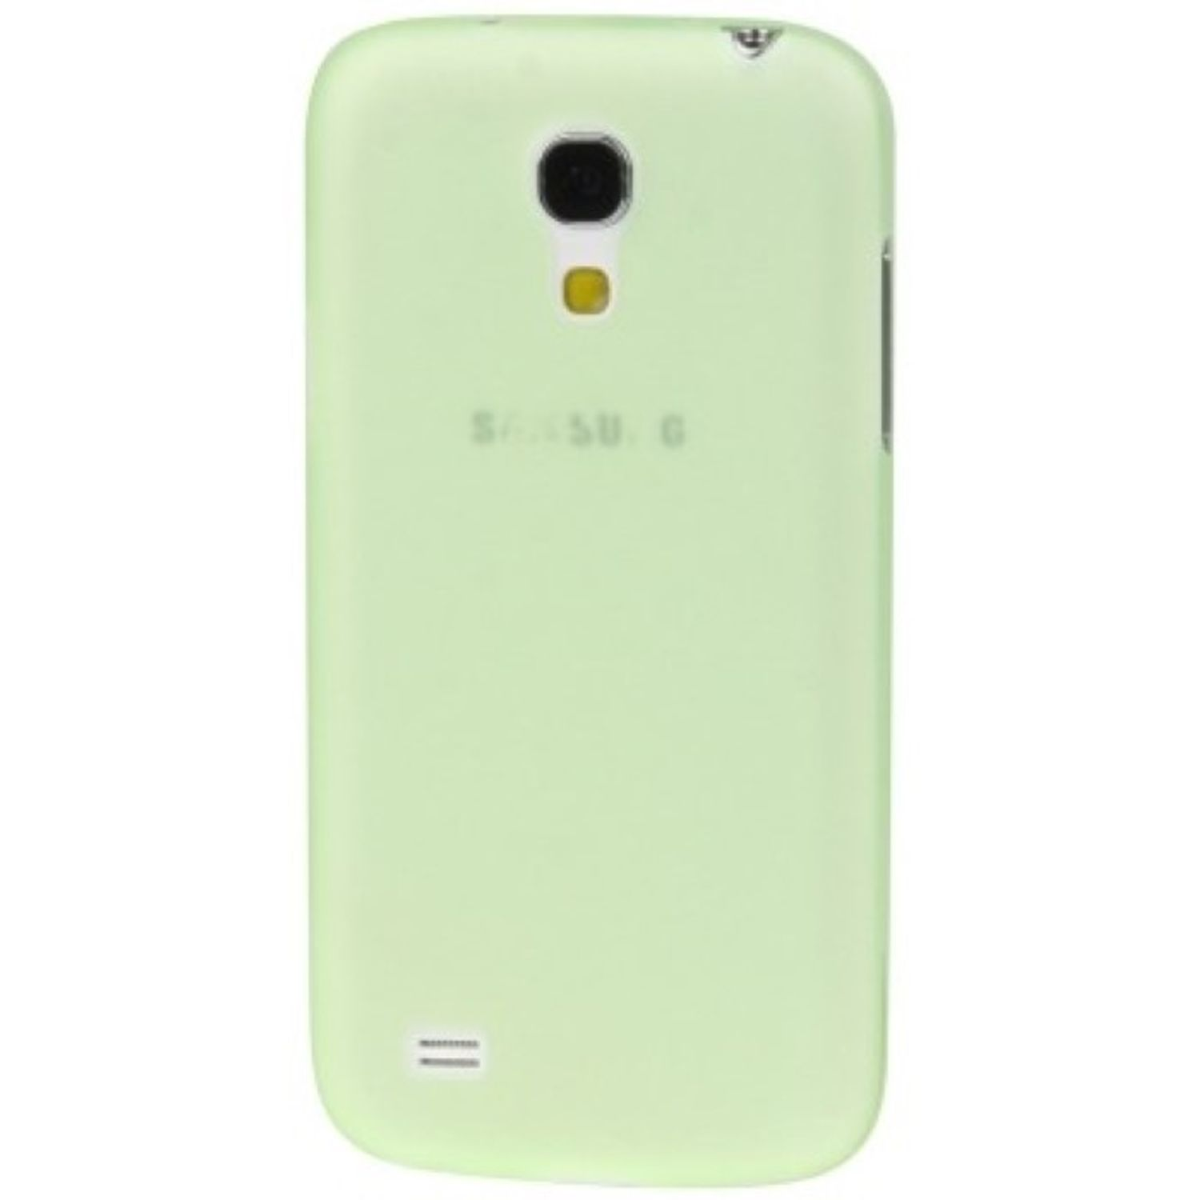 Schutzhülle Case Ultra Dünn 0,3mm für Handy Samsung Galaxy S4 mini i9190 Grün Transparent